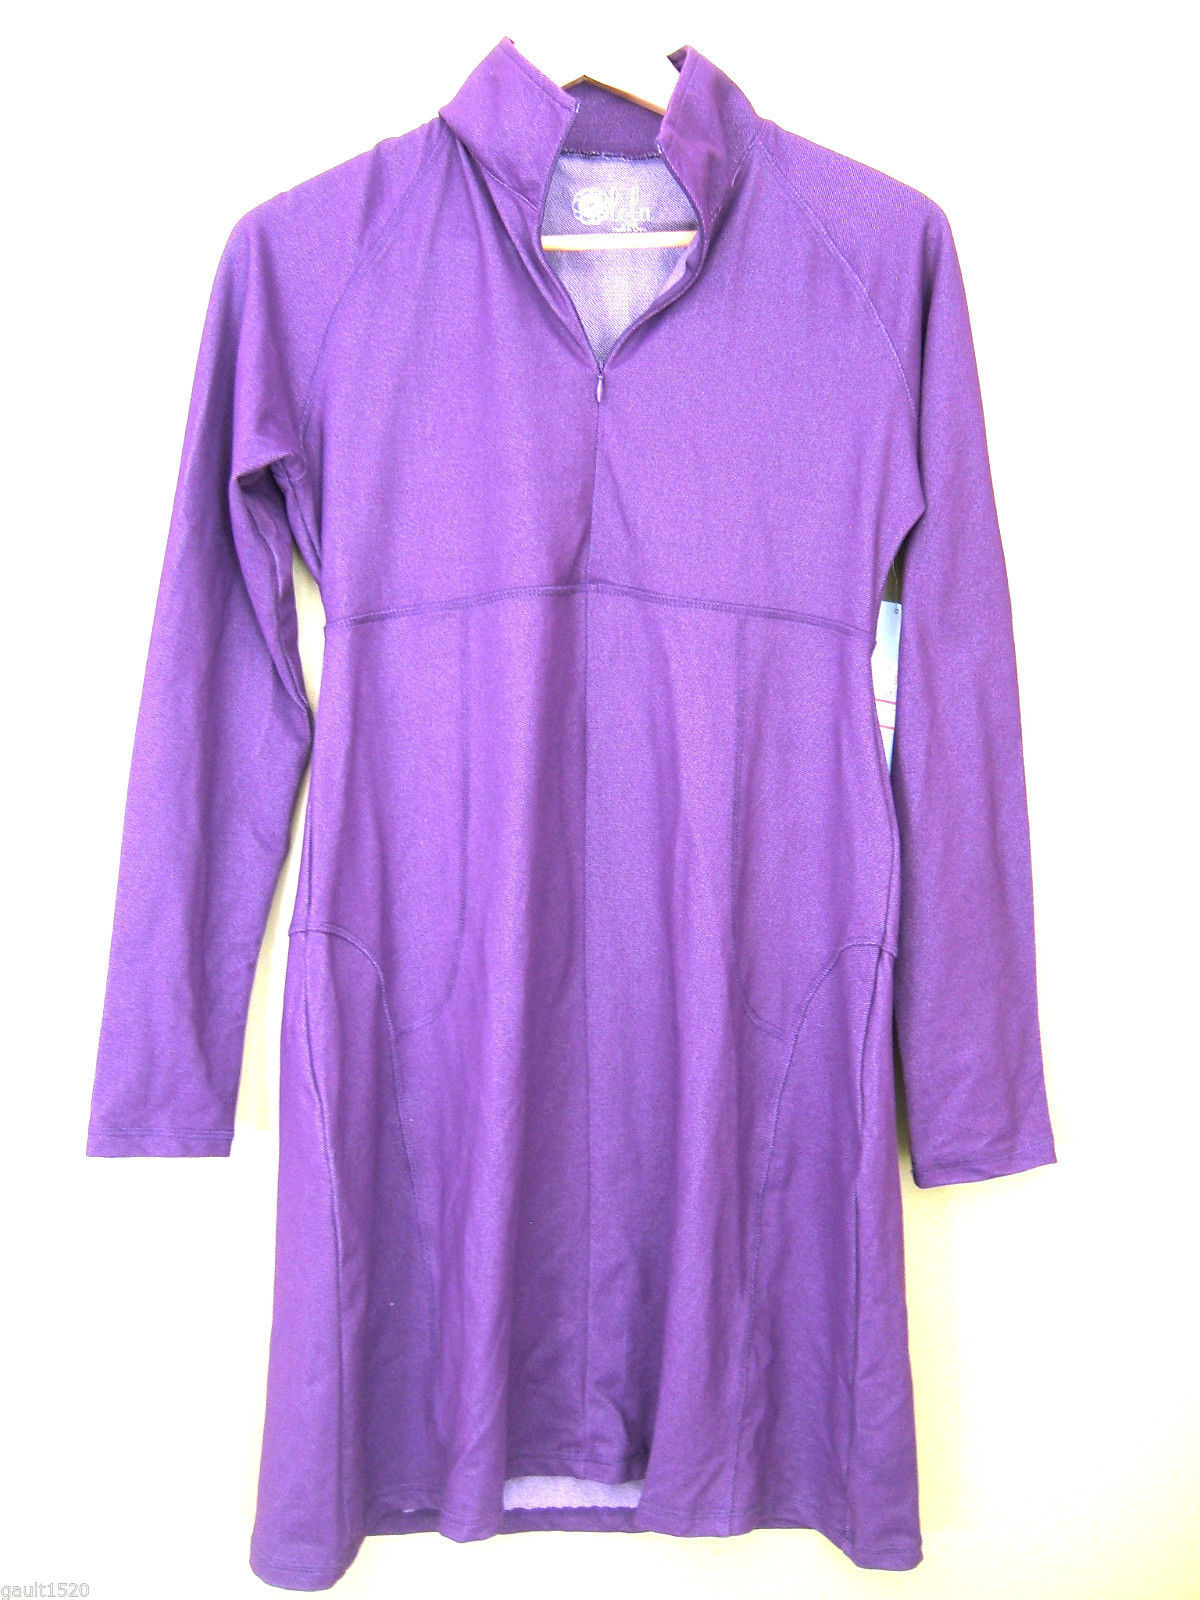 NWT Lola Gorgeous Yoga Athletic Stretch Tunic Top Purple Zip Long Jacket S $138 - $78.00